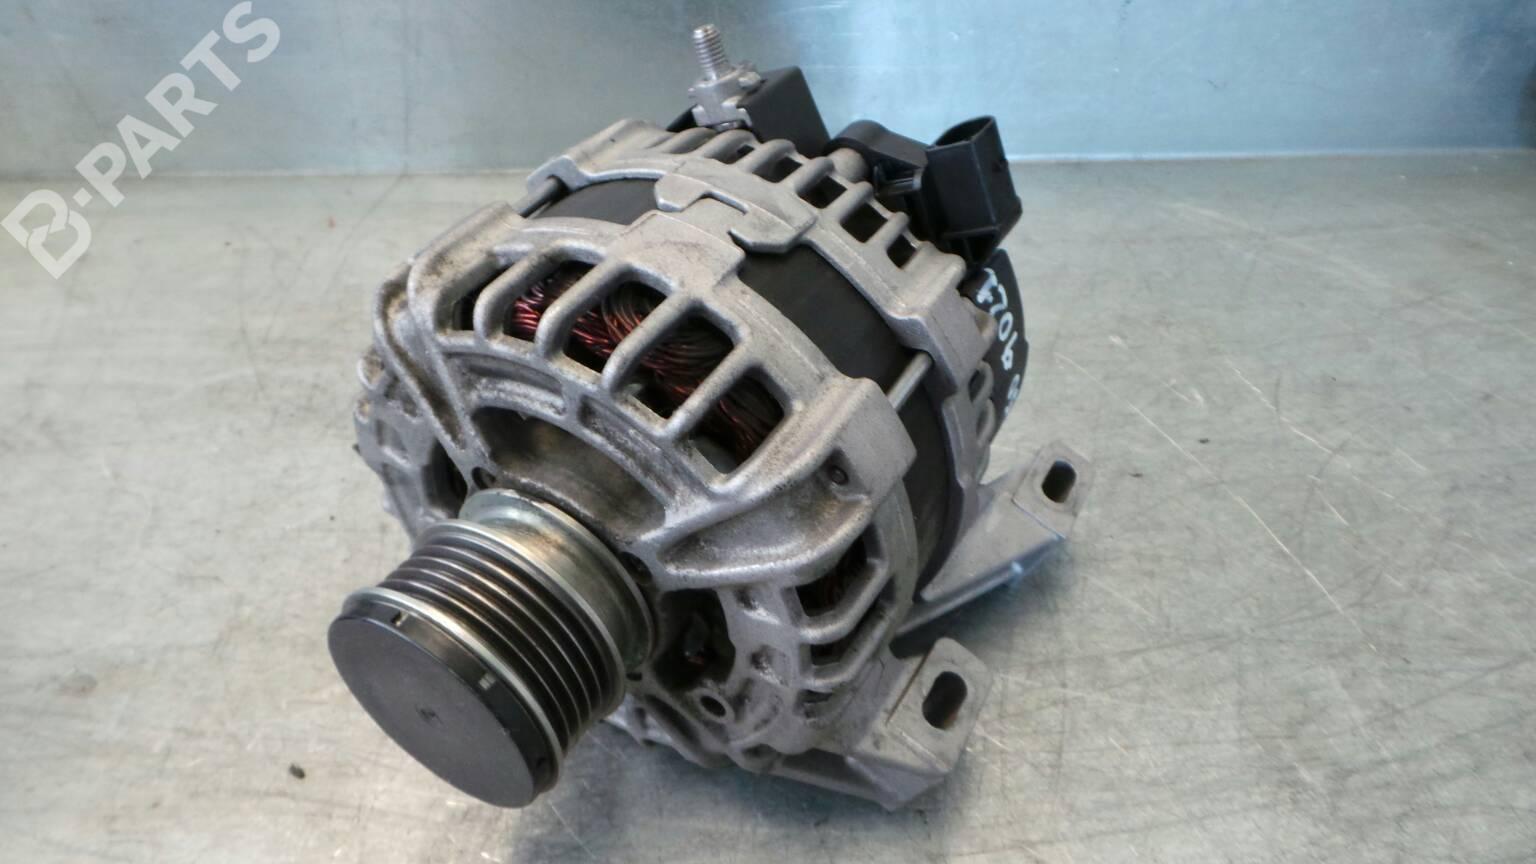 na turbo twin yet tt volvo nissan p non infiniti no alternator oem reviews amp assembly